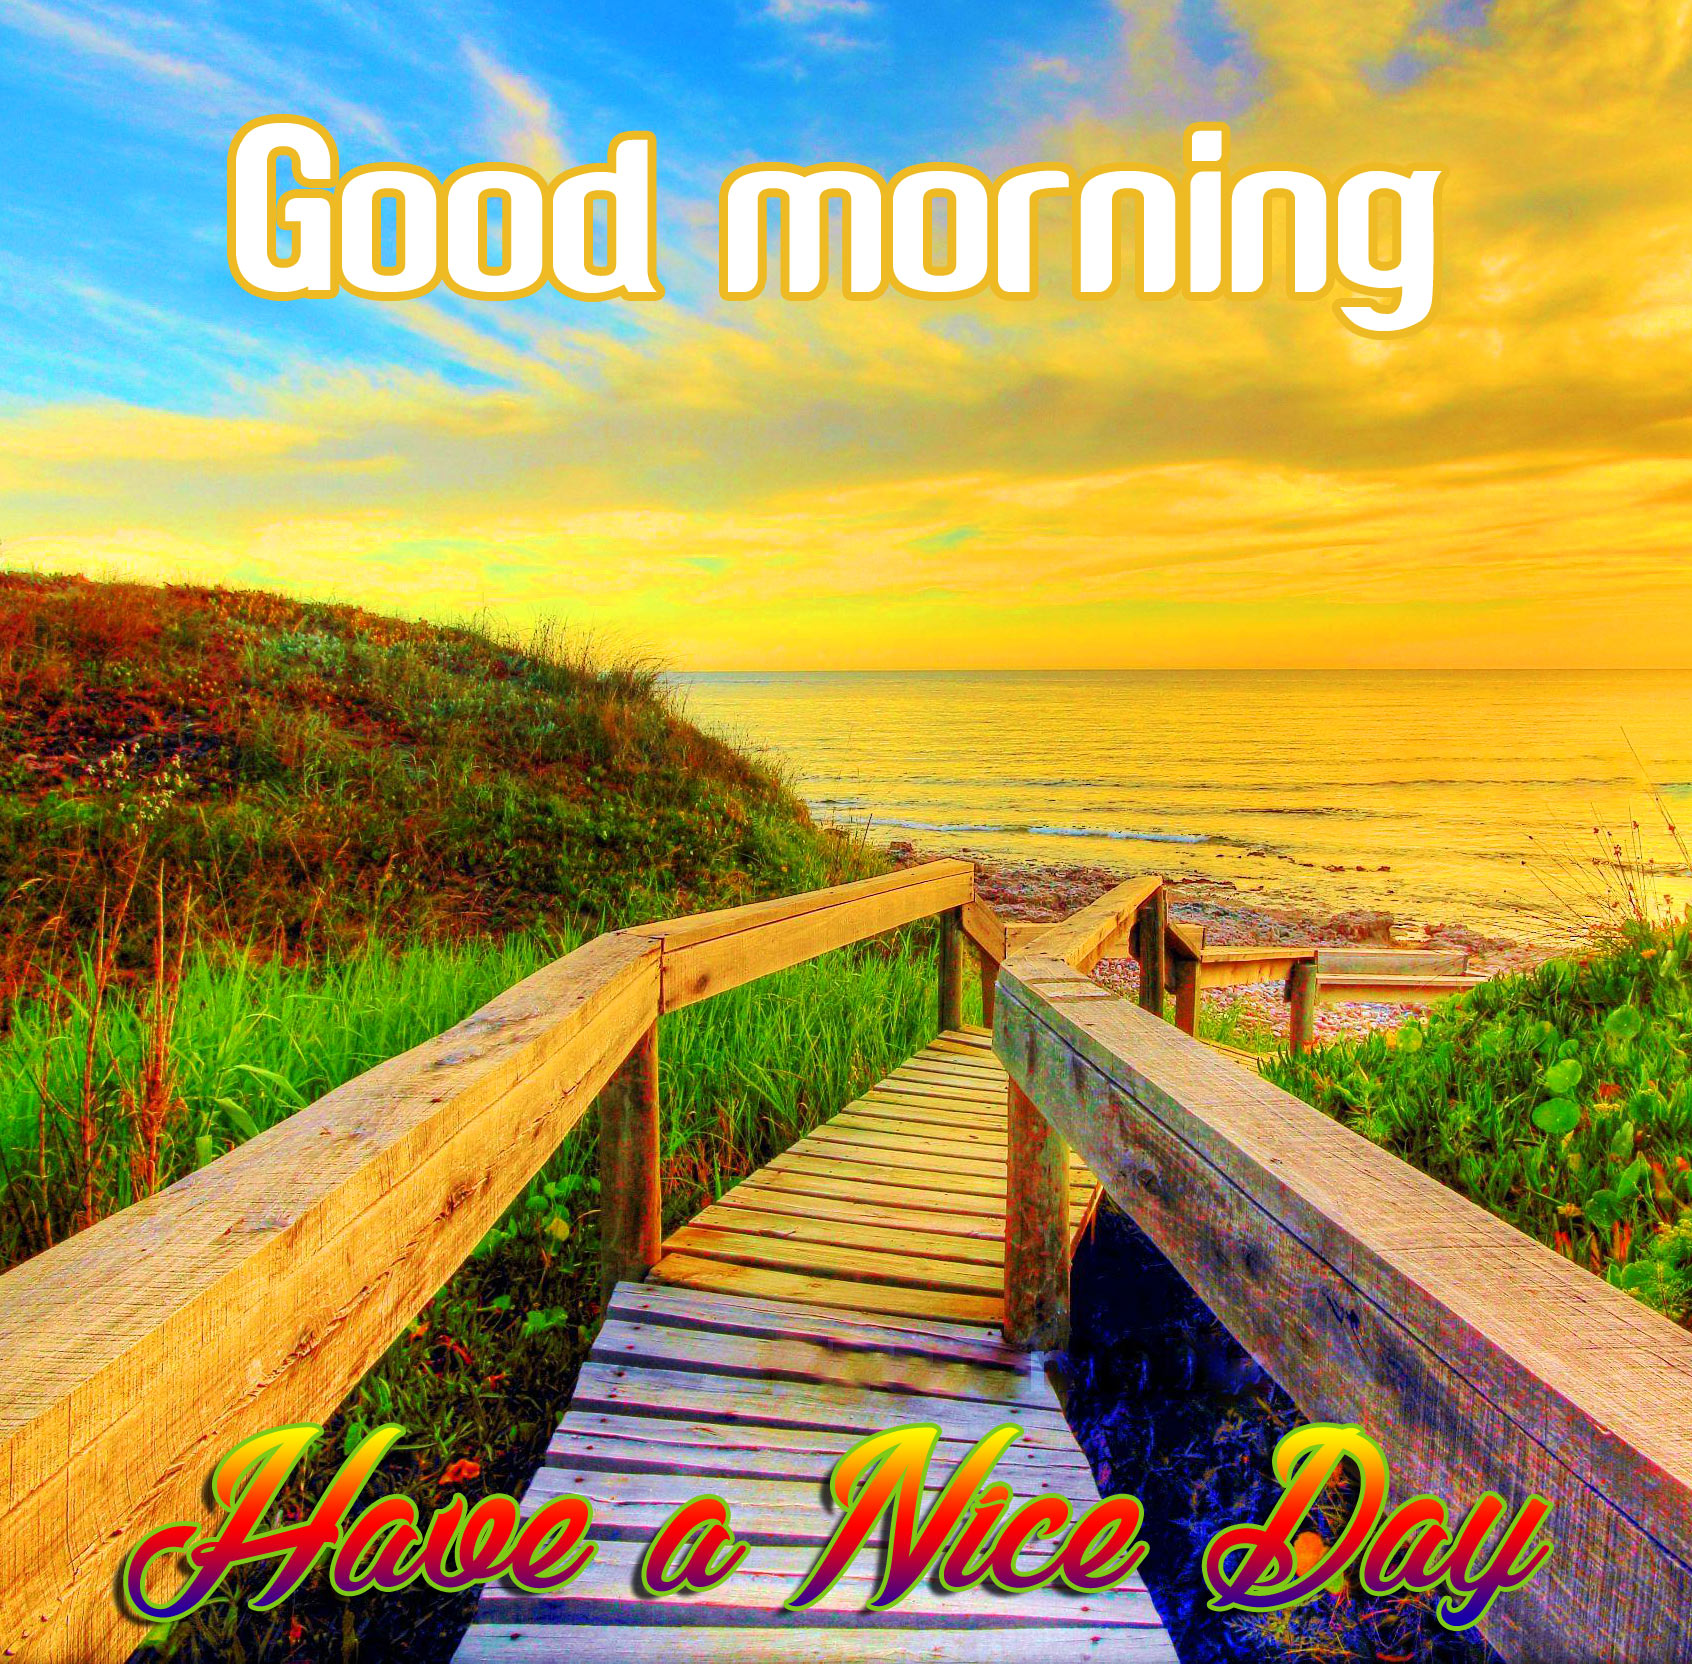 Beautiful Good Morning Scenery Images Photos Hd Download Good Morning